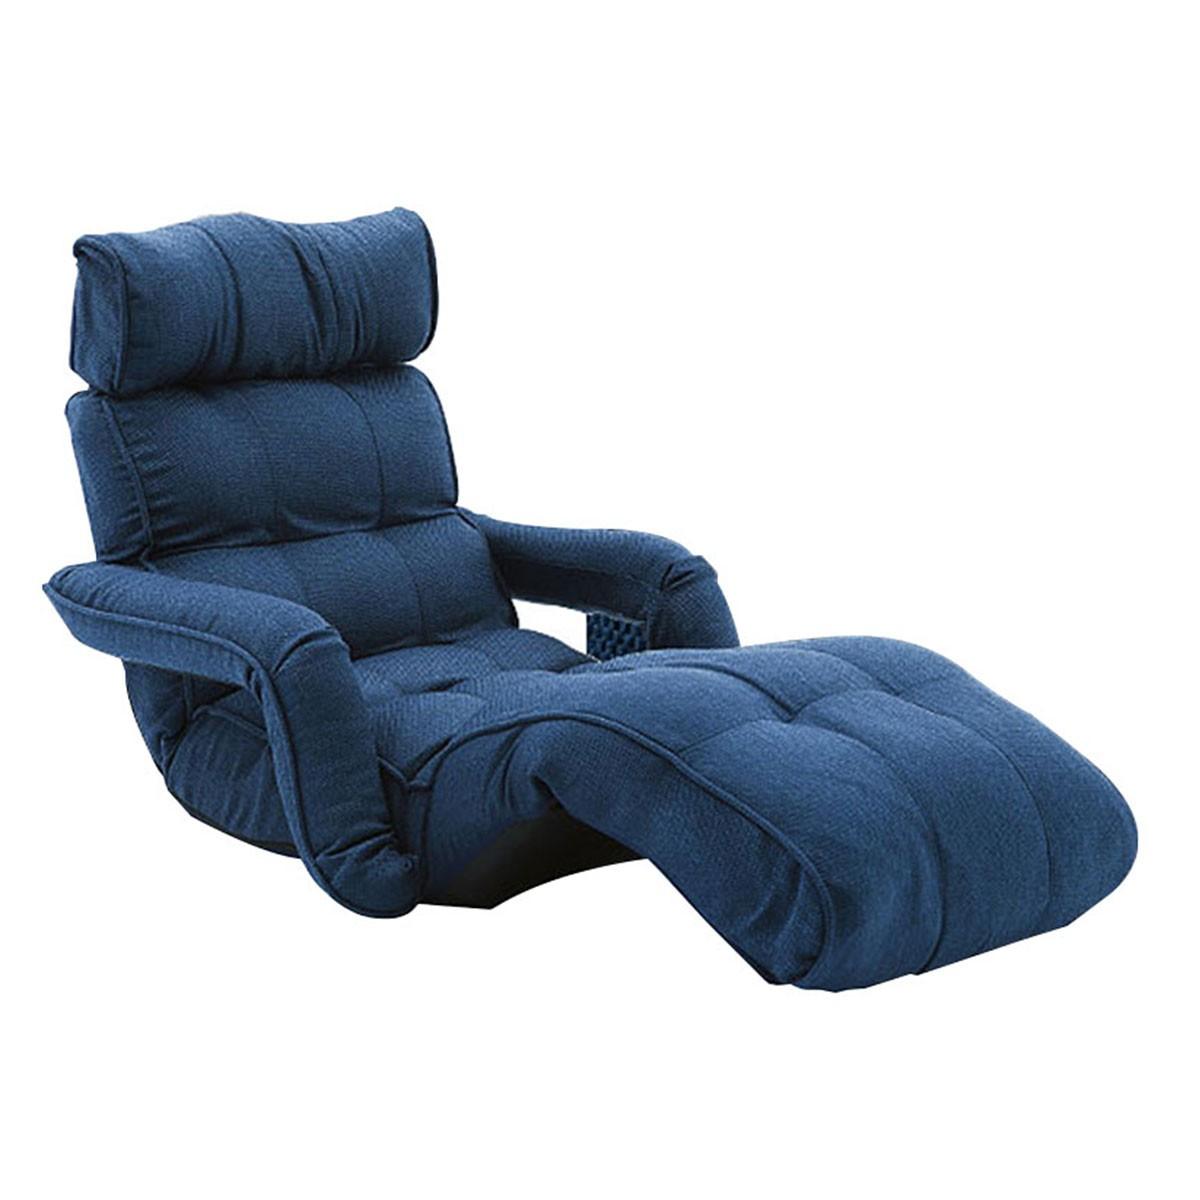 blue fabric recliner sofa new cushions dfs dark soft linen folding floor